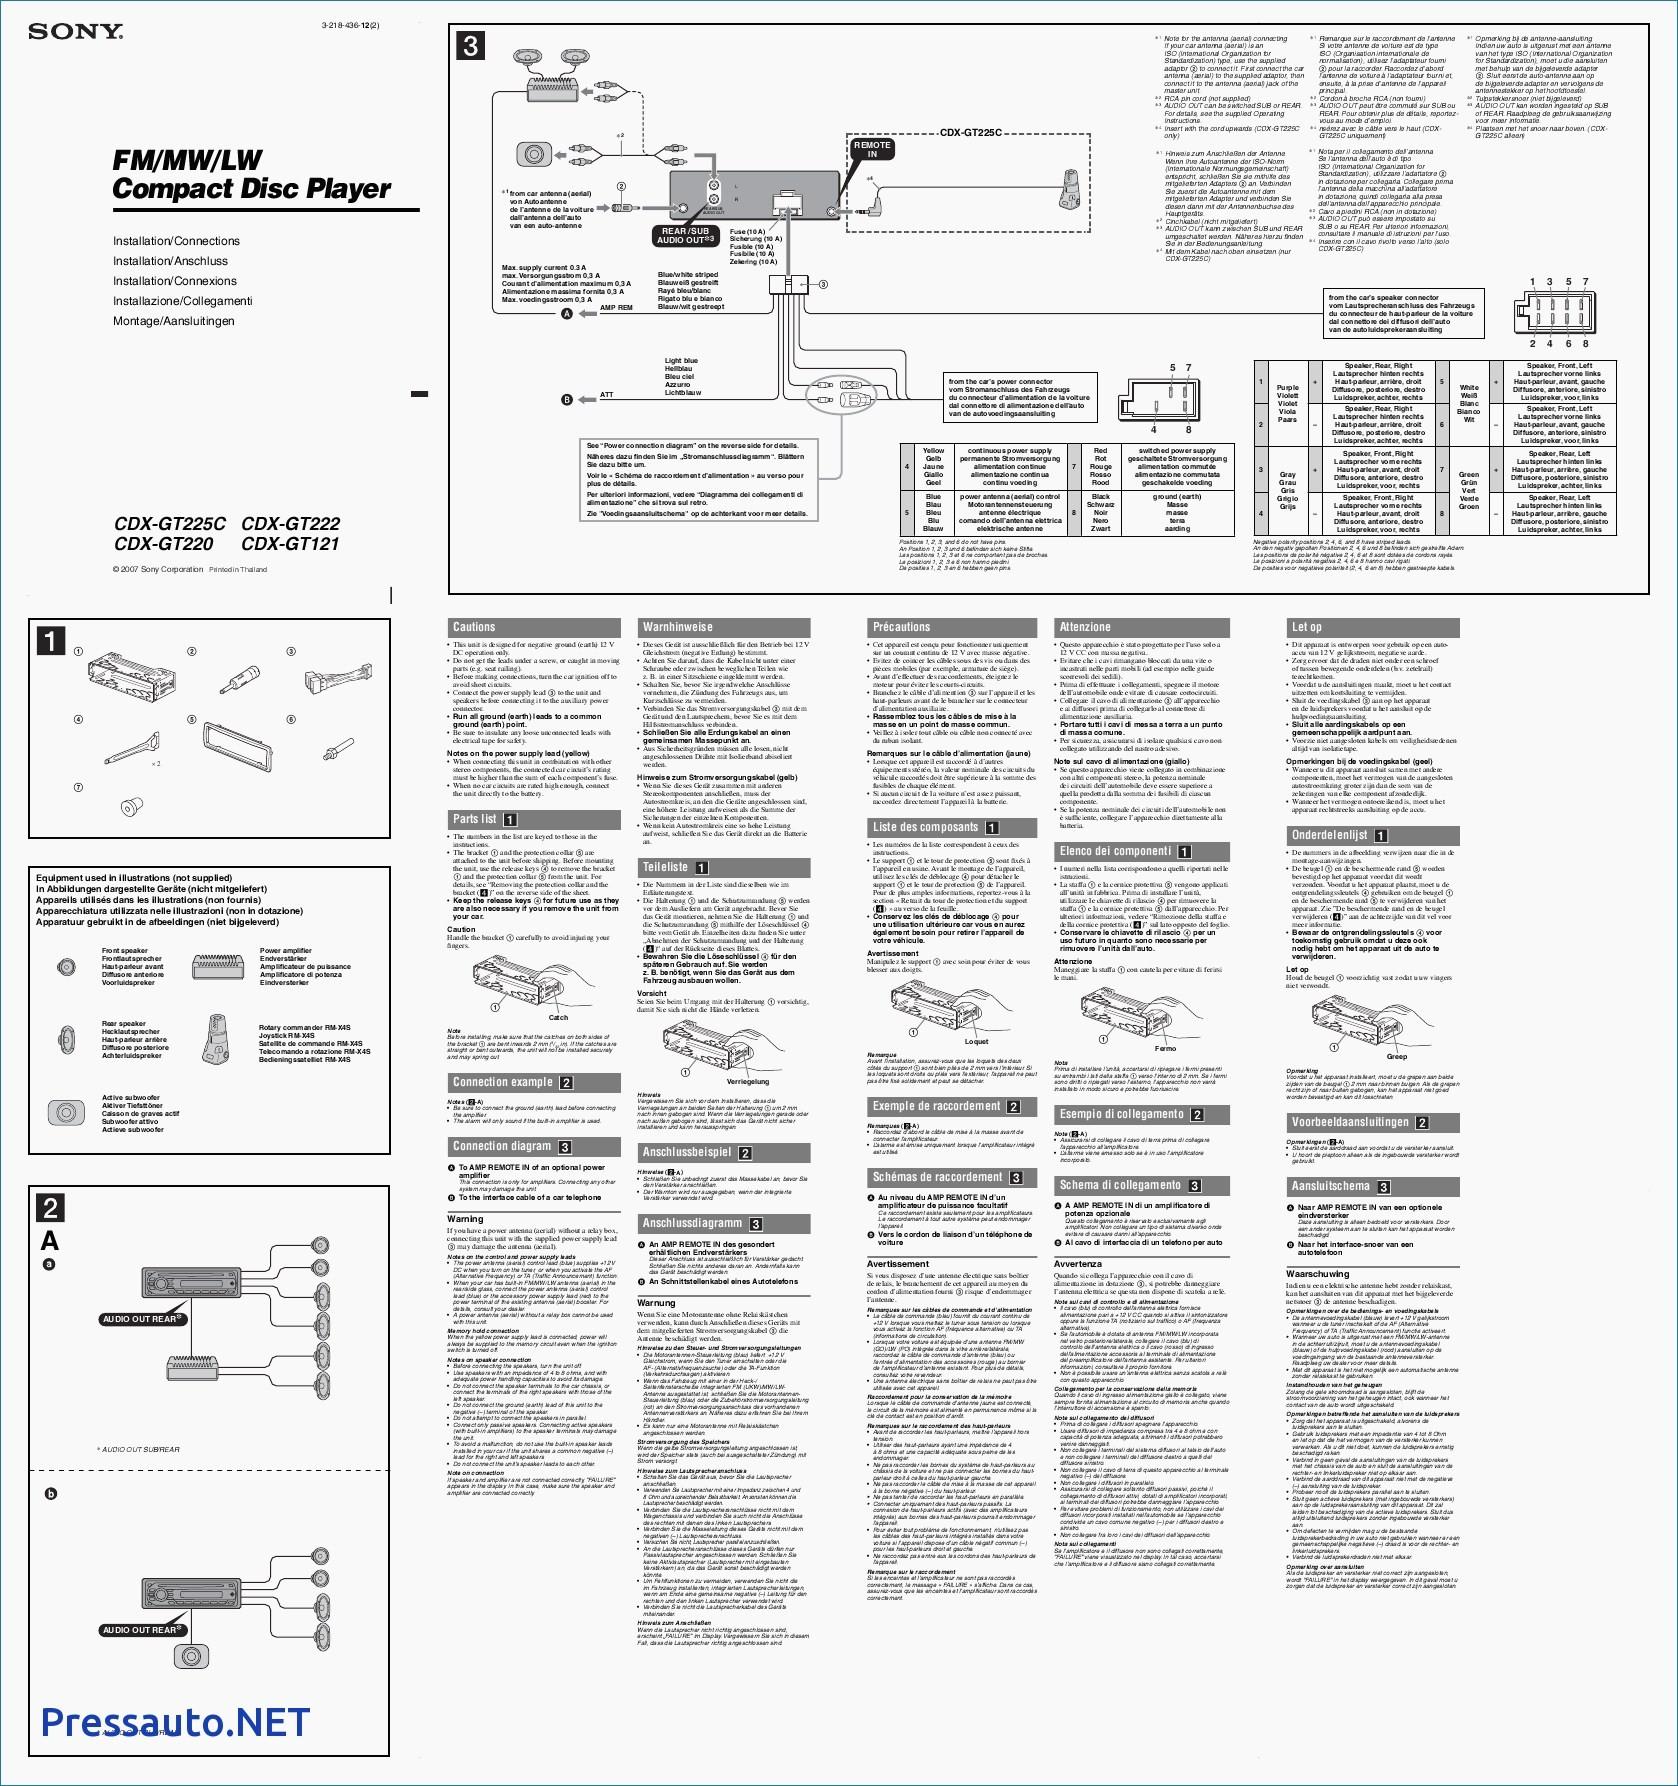 Sony Cdx Gt610Ui Wiring Diagram from diagramweb.net